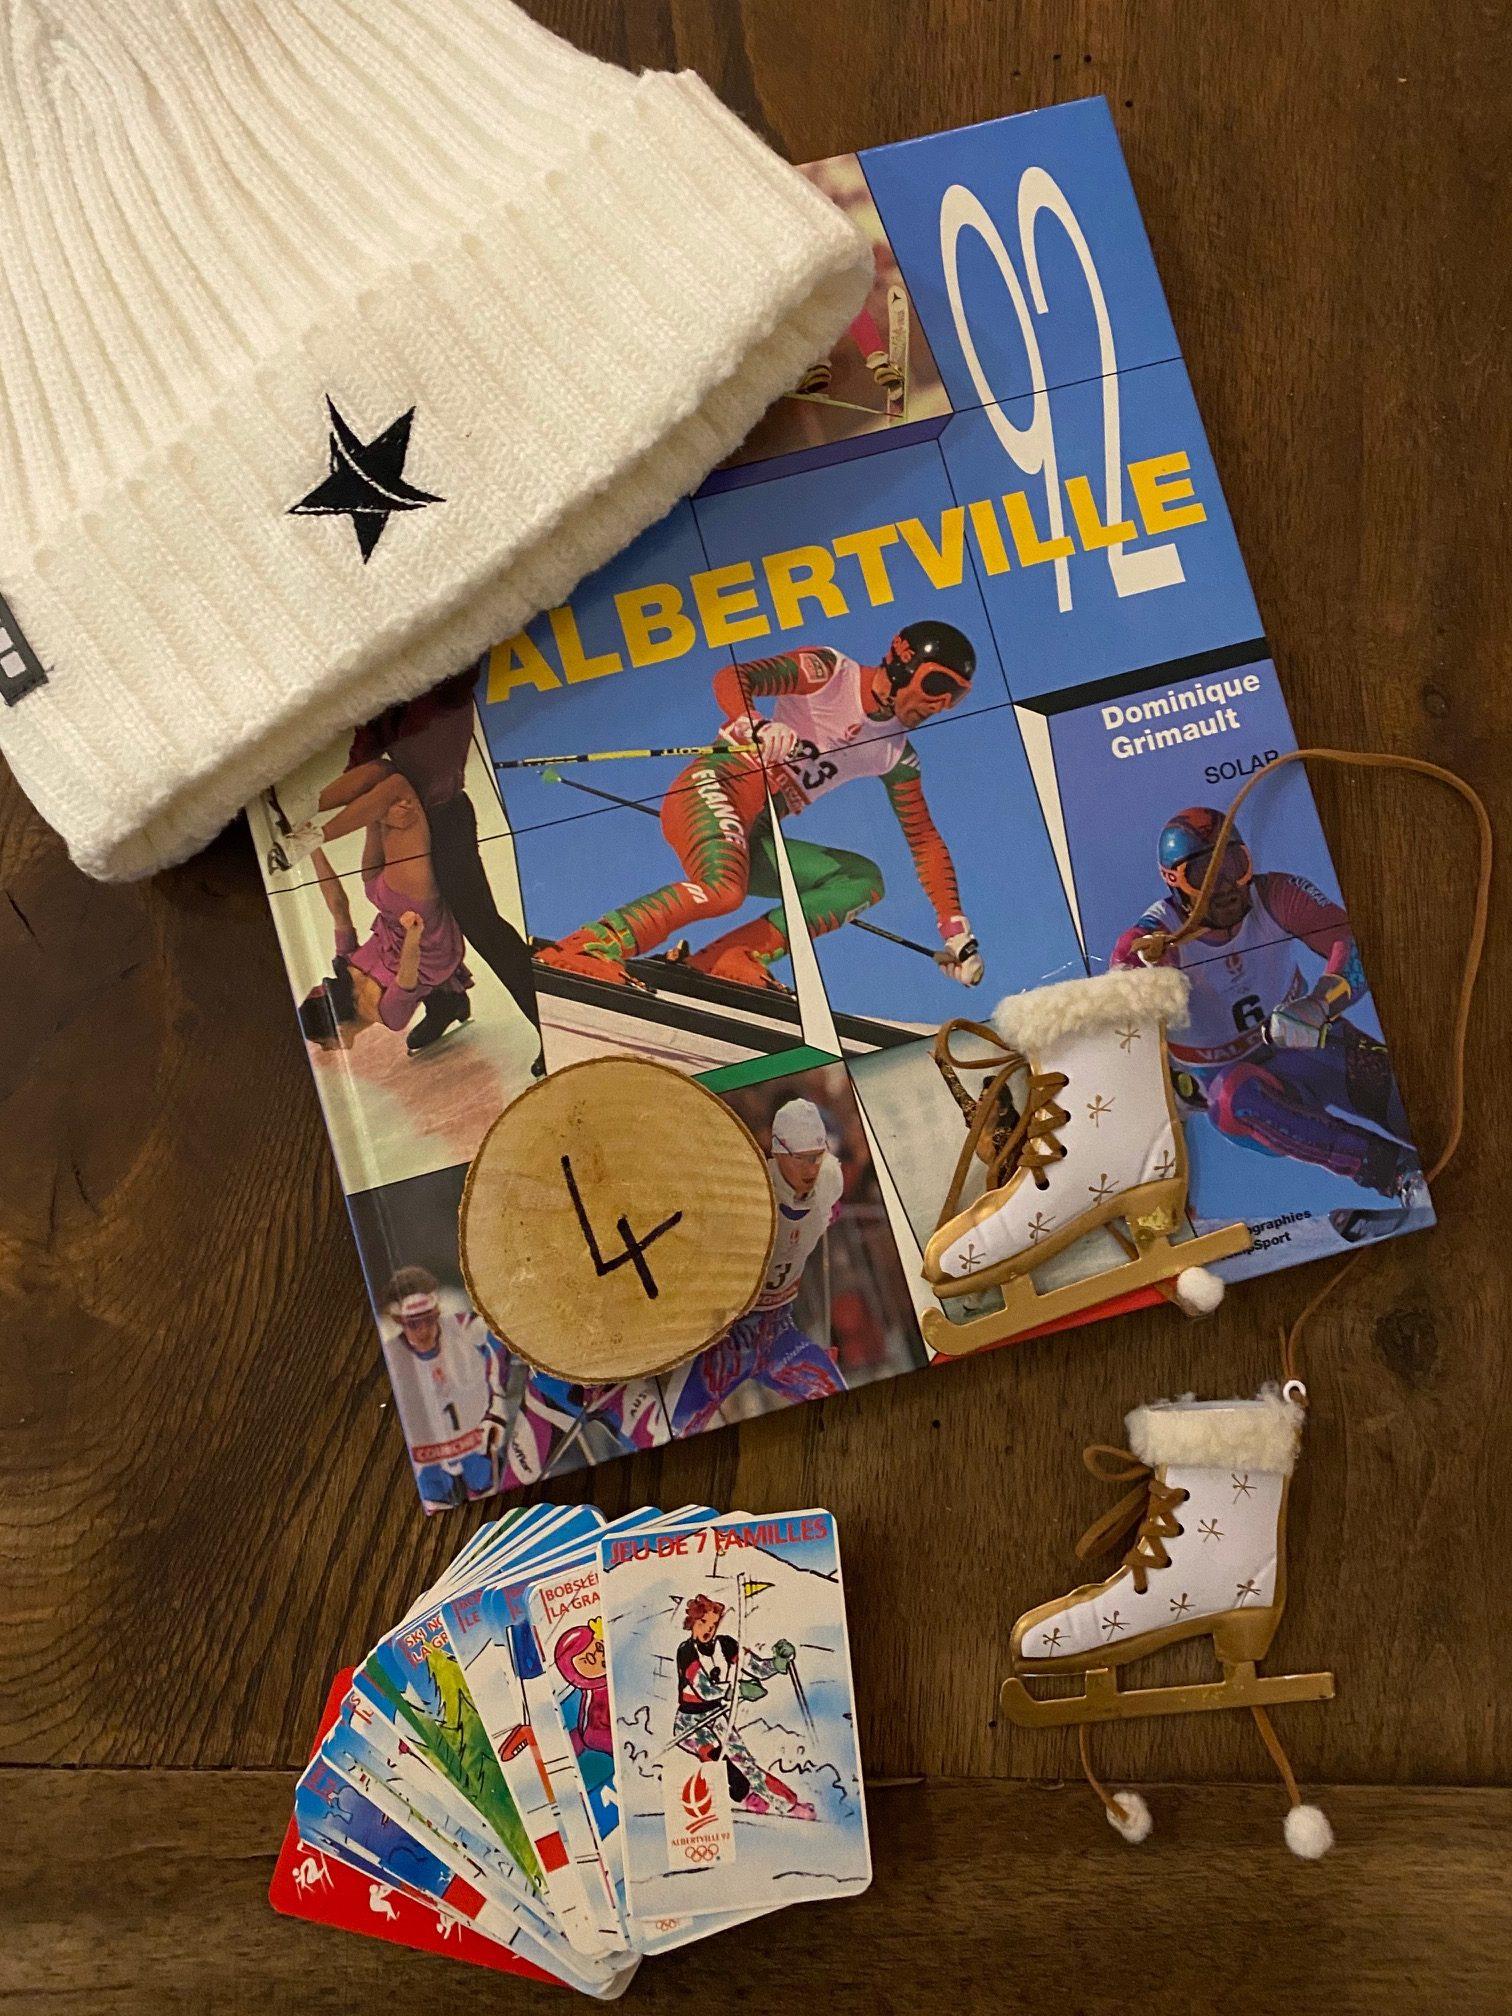 halle olympique pays albertville 1992